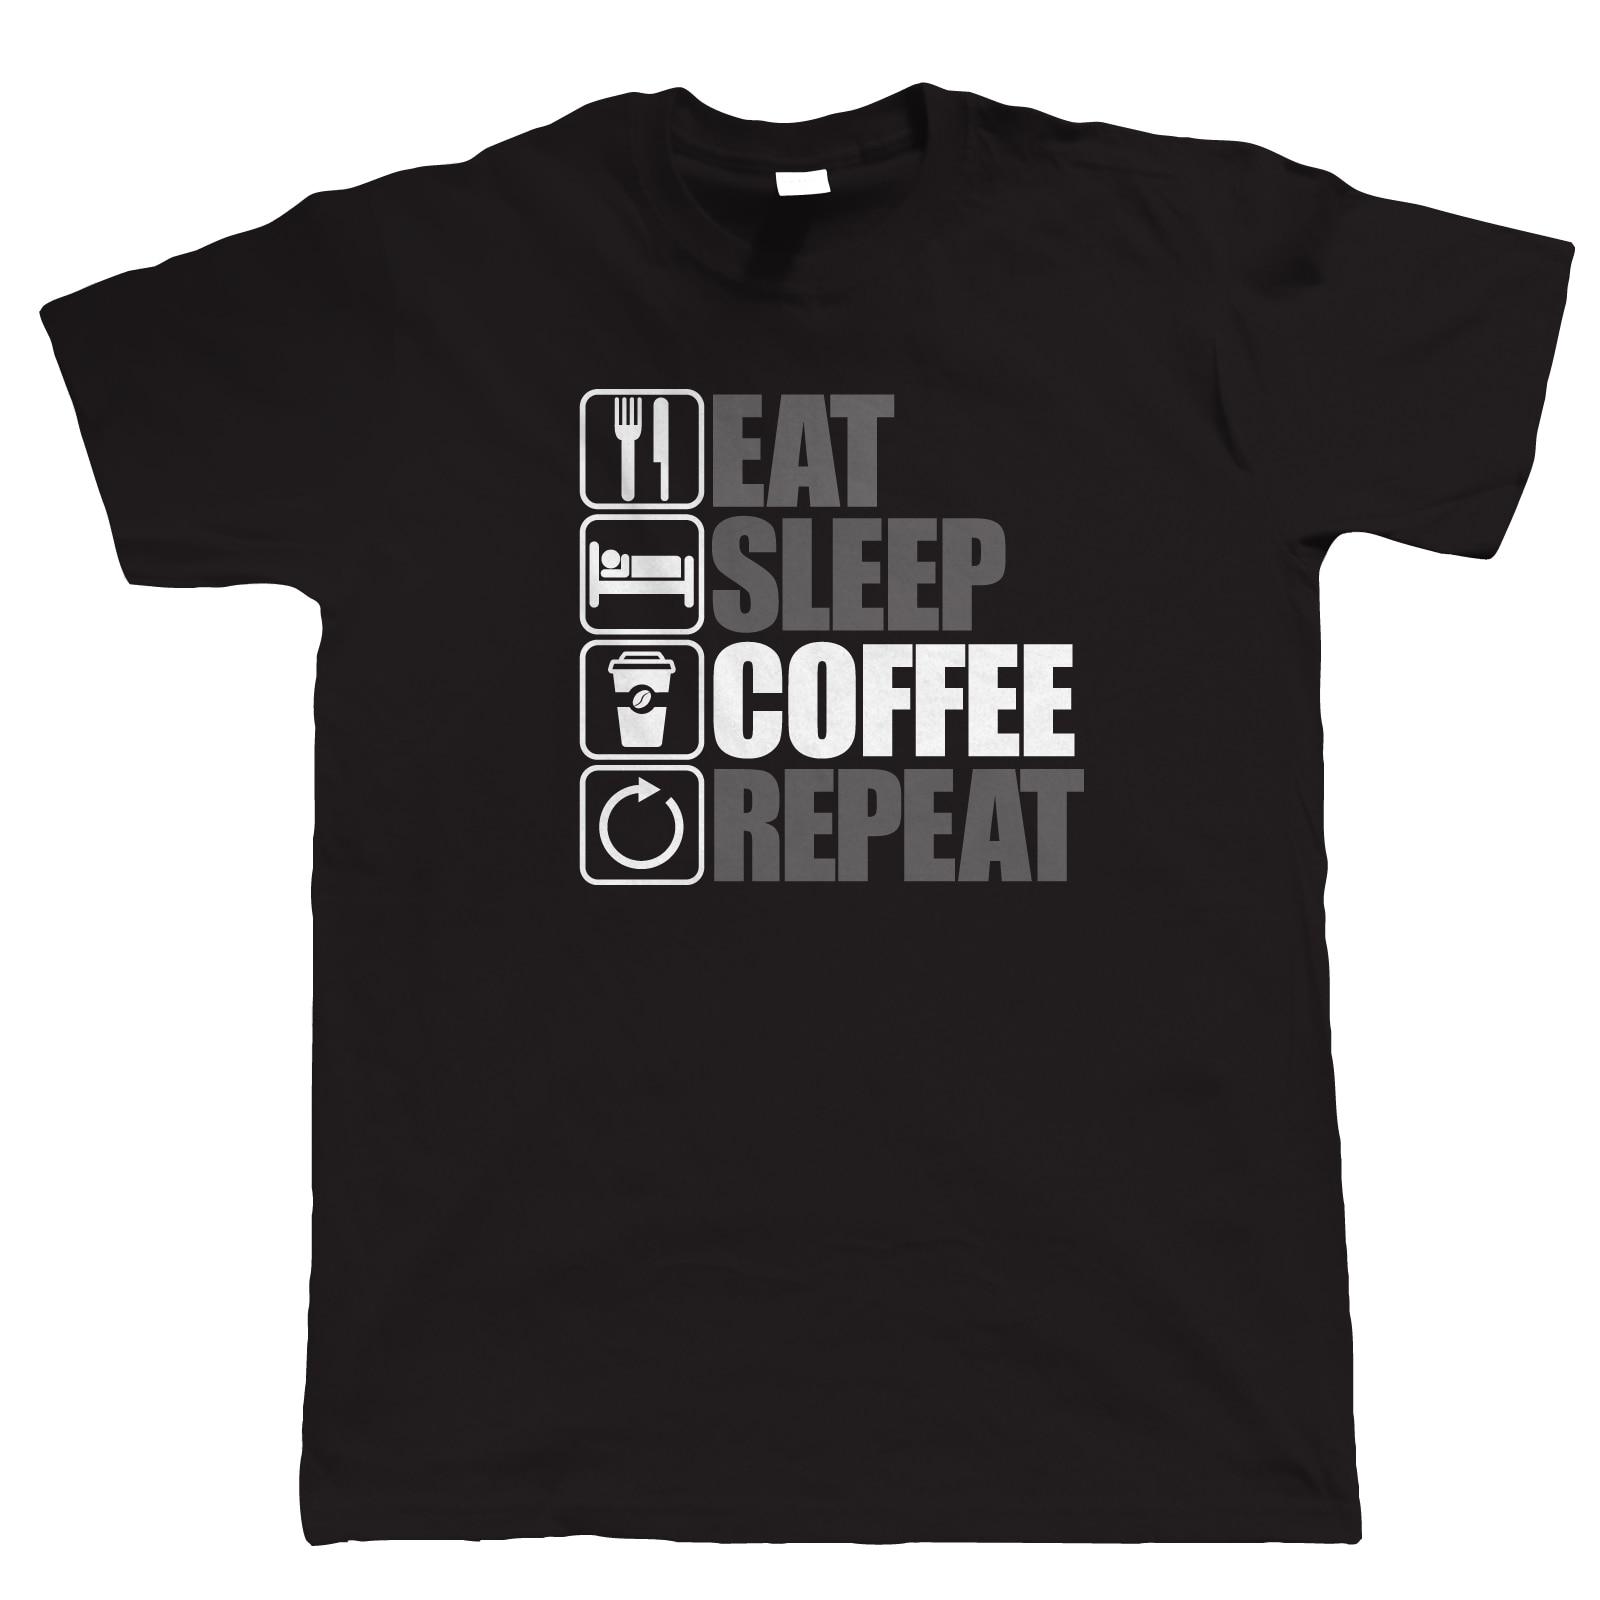 2018 Fashion Hot sale Eat Sleep Coffee Repeat, Mens Funny, Caffeine T Shirt, Gift Dad Tee shirt